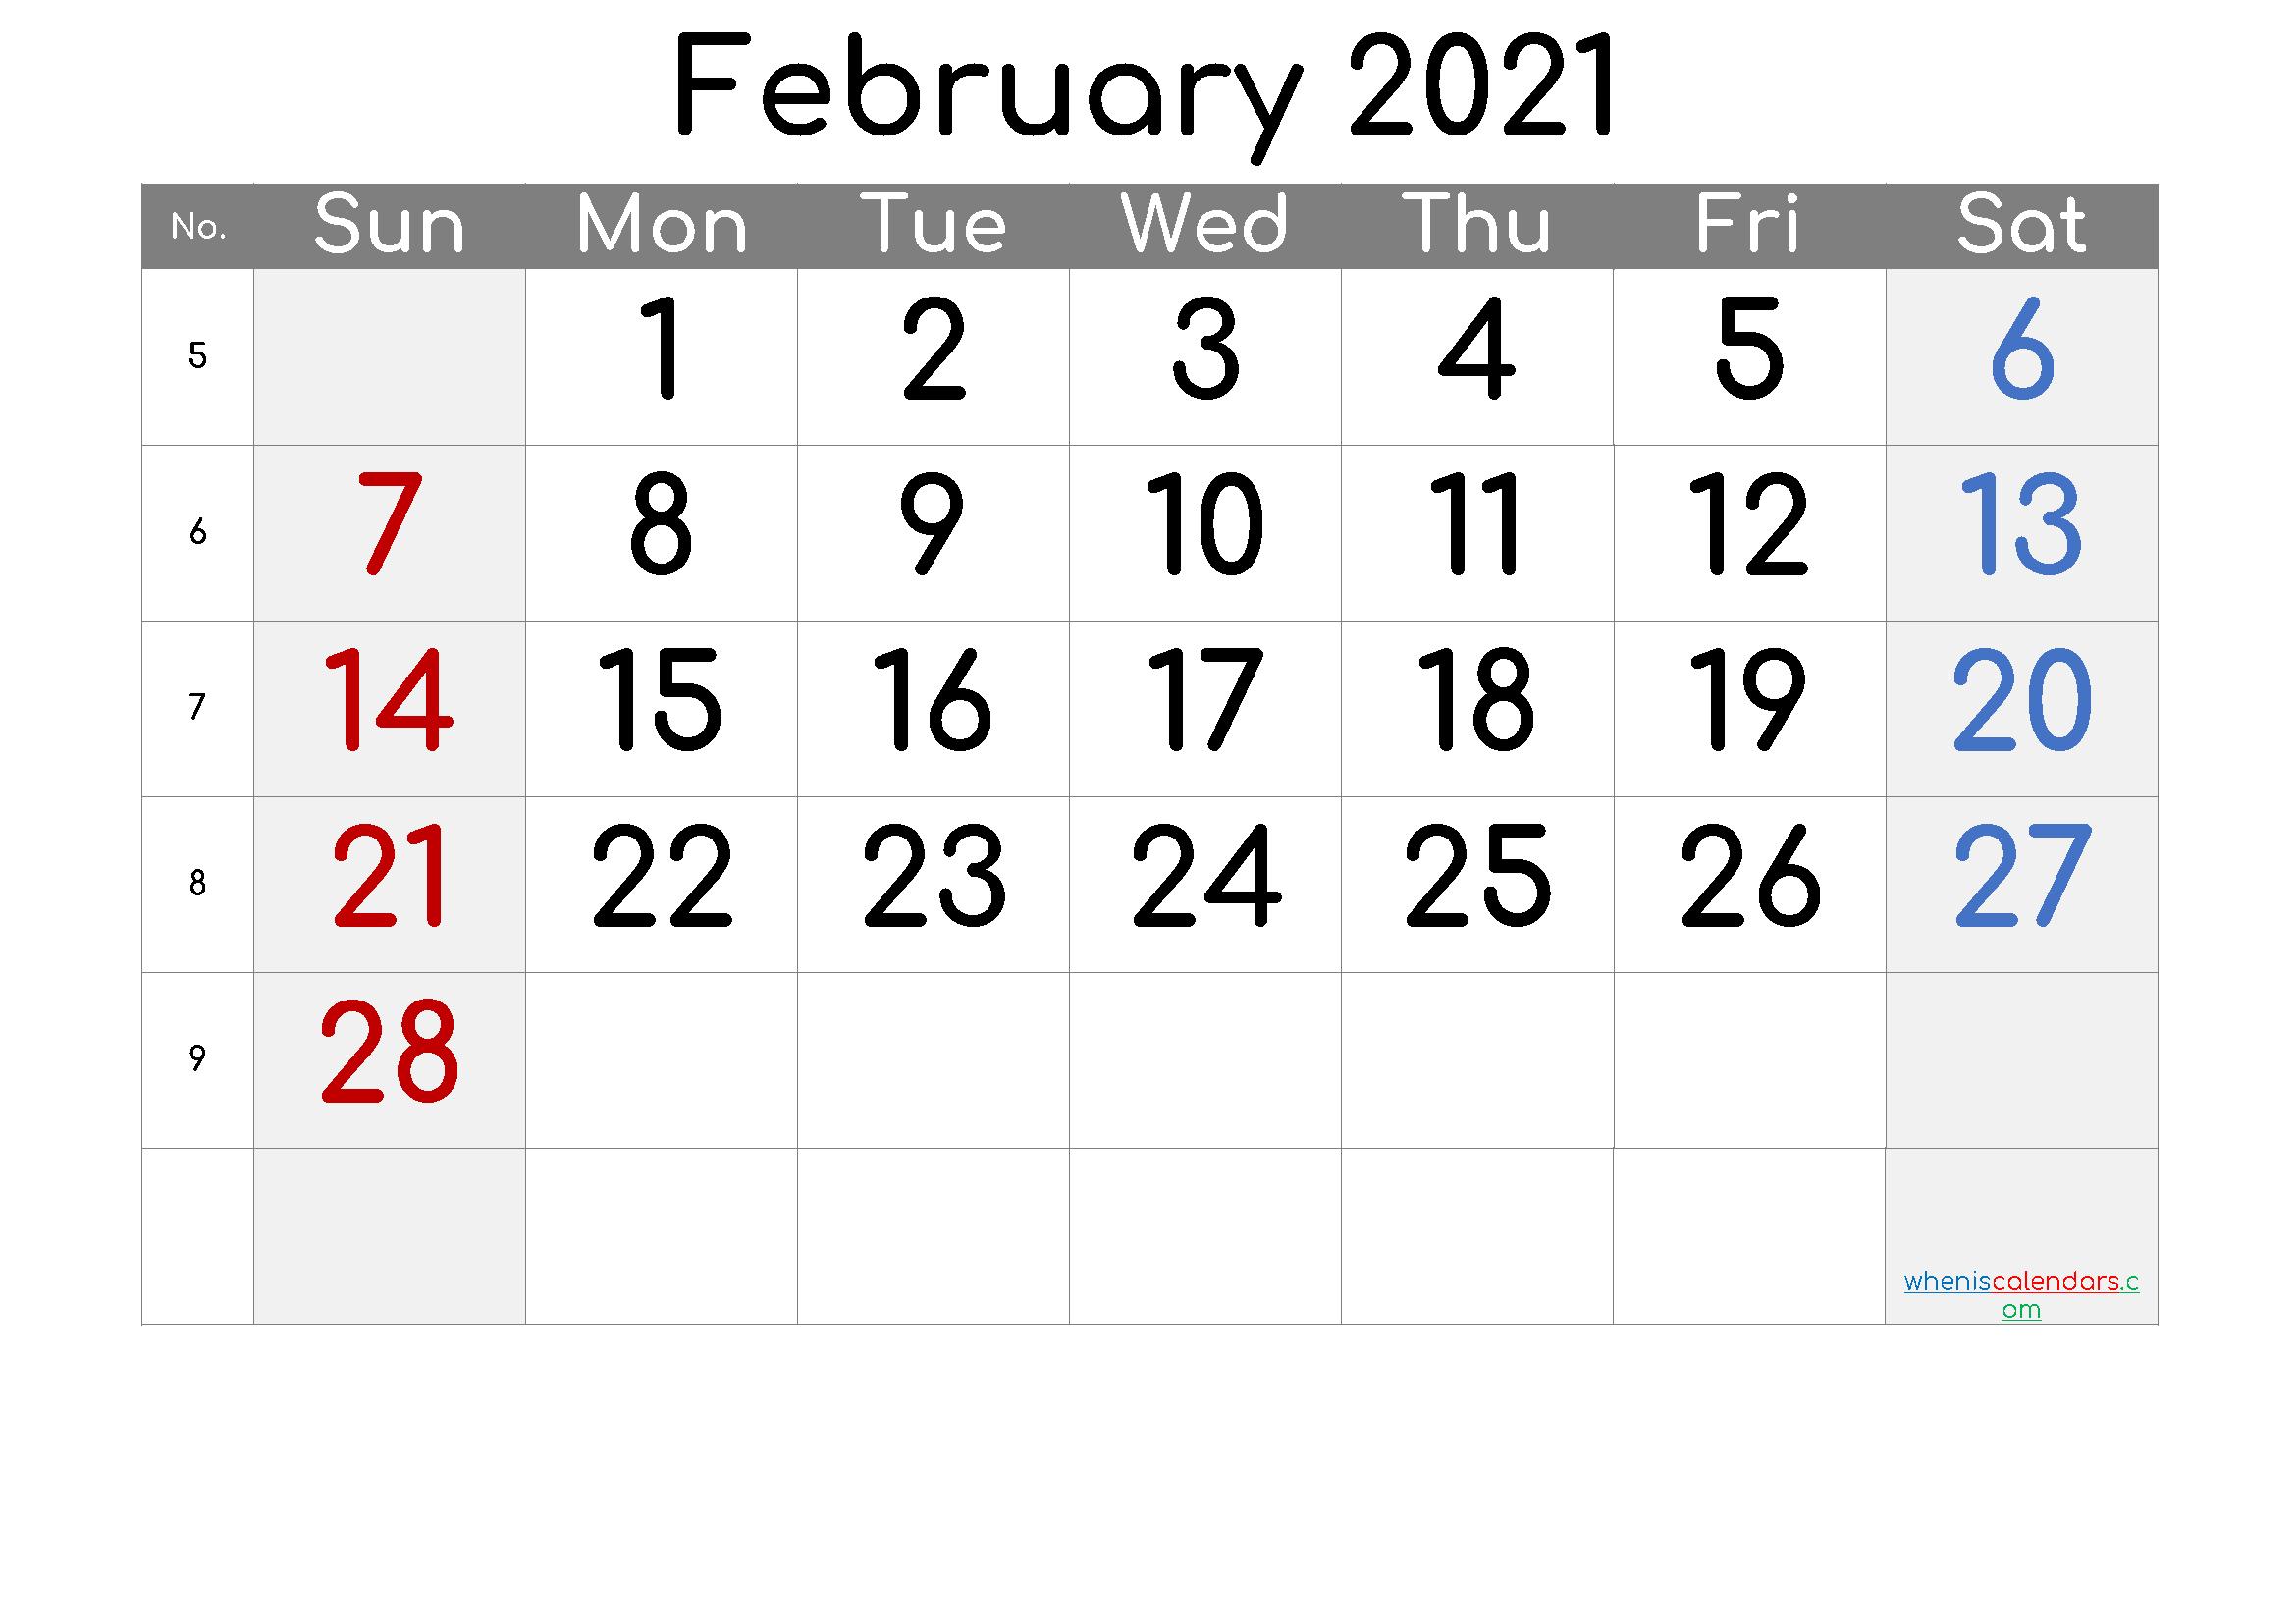 Free Printable February 2021 Calendar - 6 Templates  February 2021 Calendar Printable